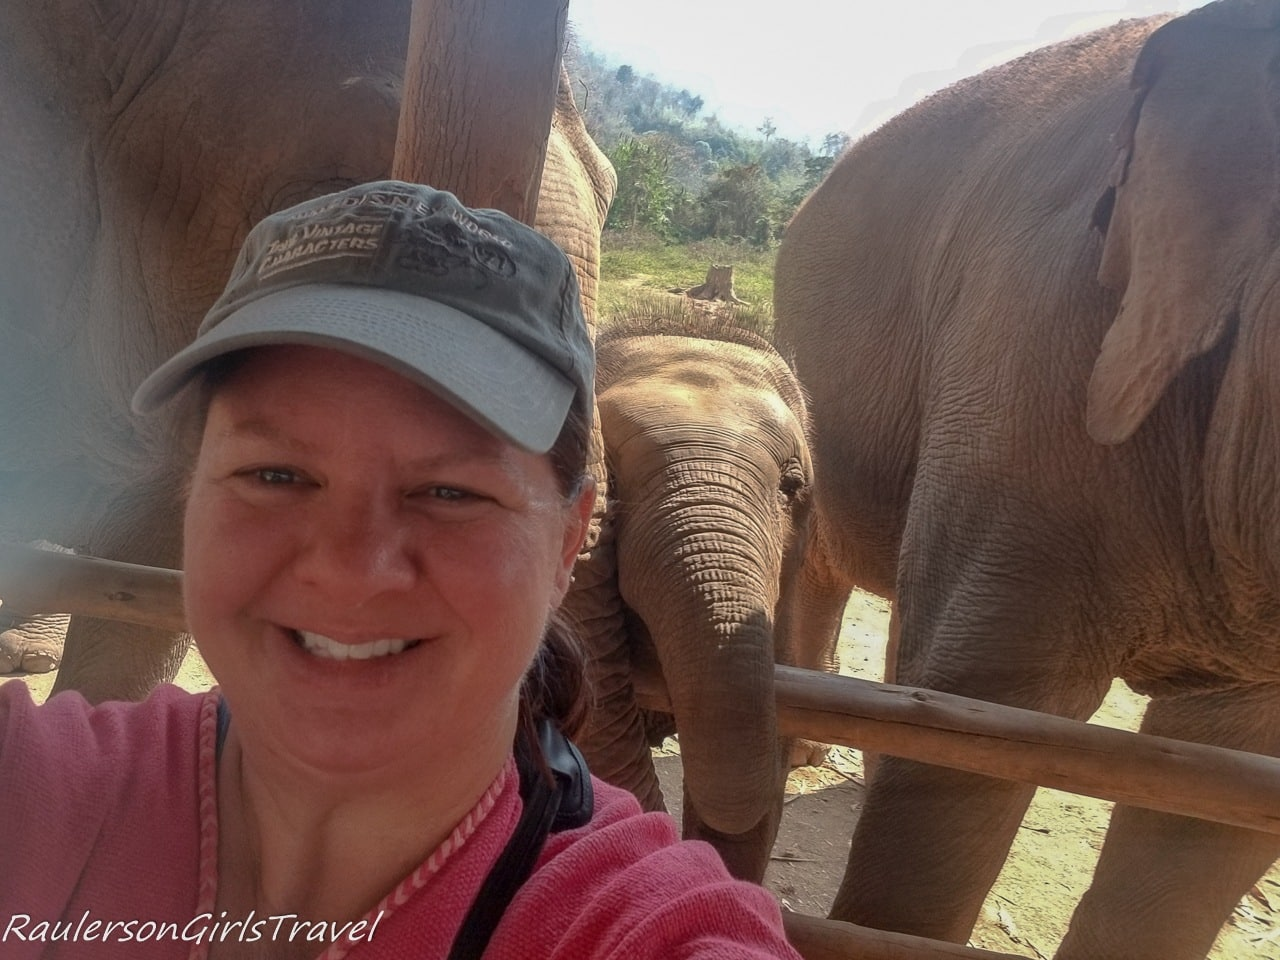 Selfie with the elephants